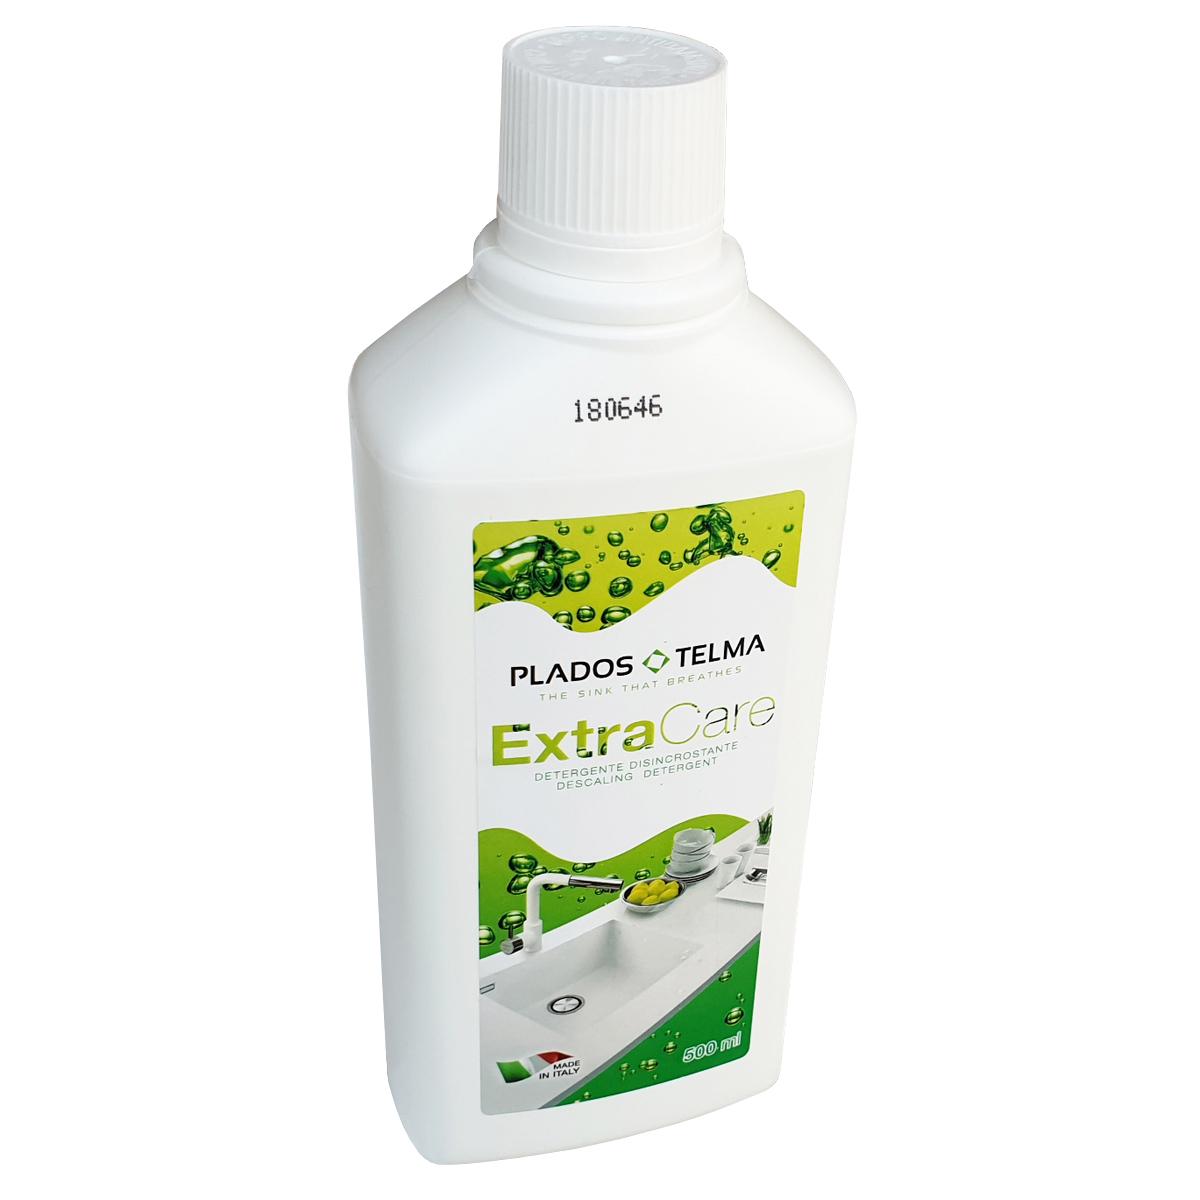 Detergent EXTRACARE TELMA & PLADOS